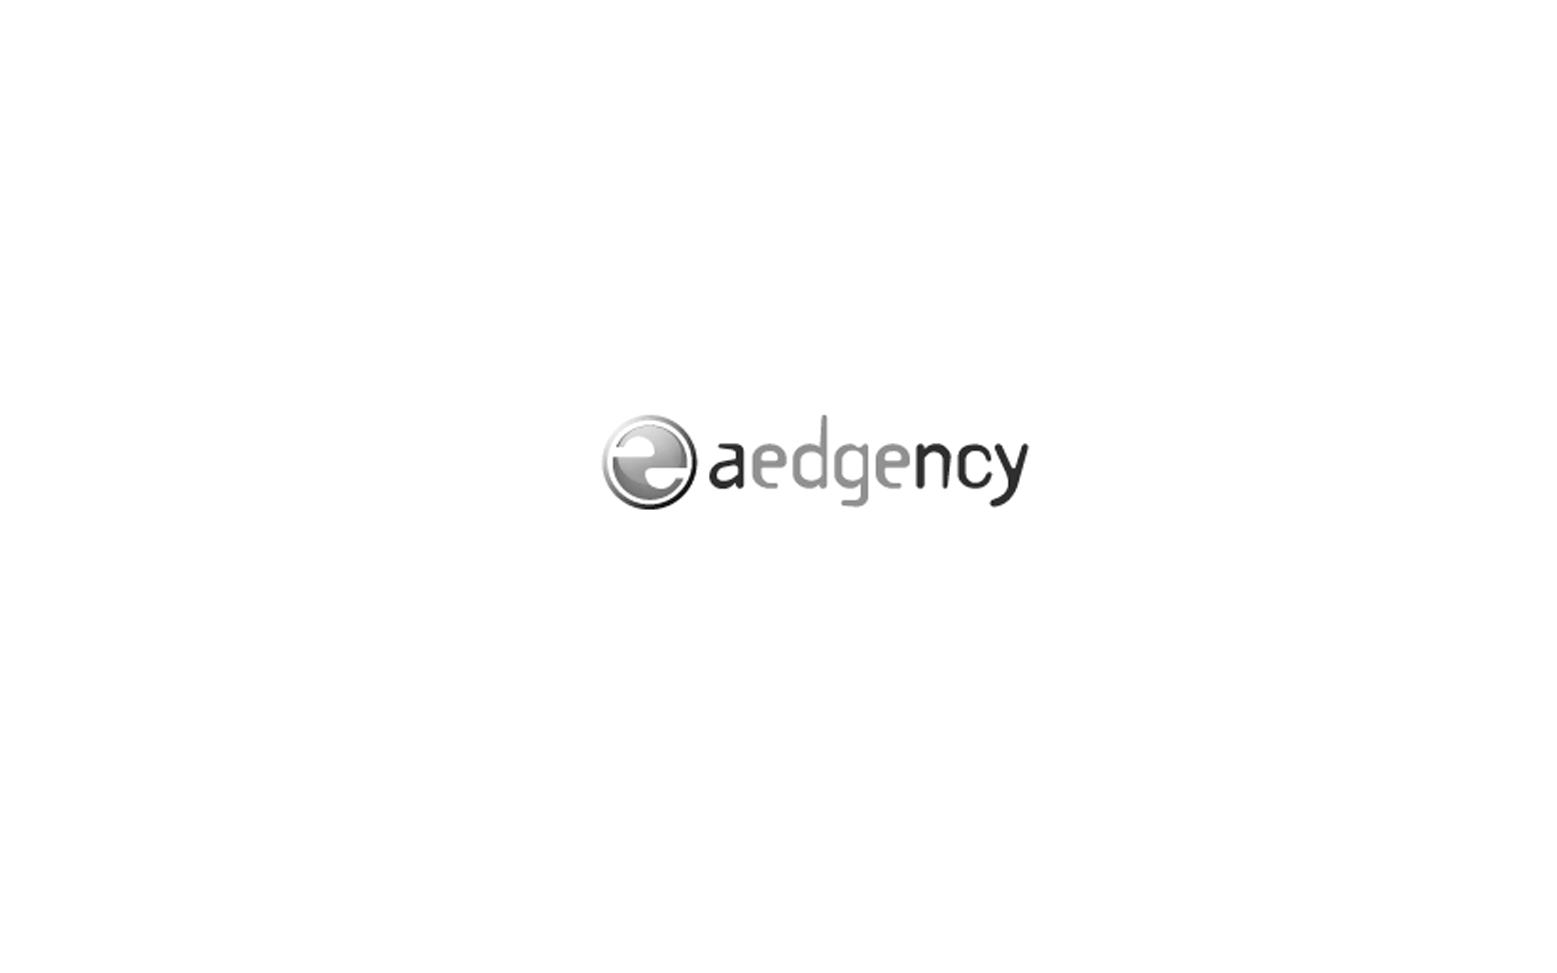 aedgency